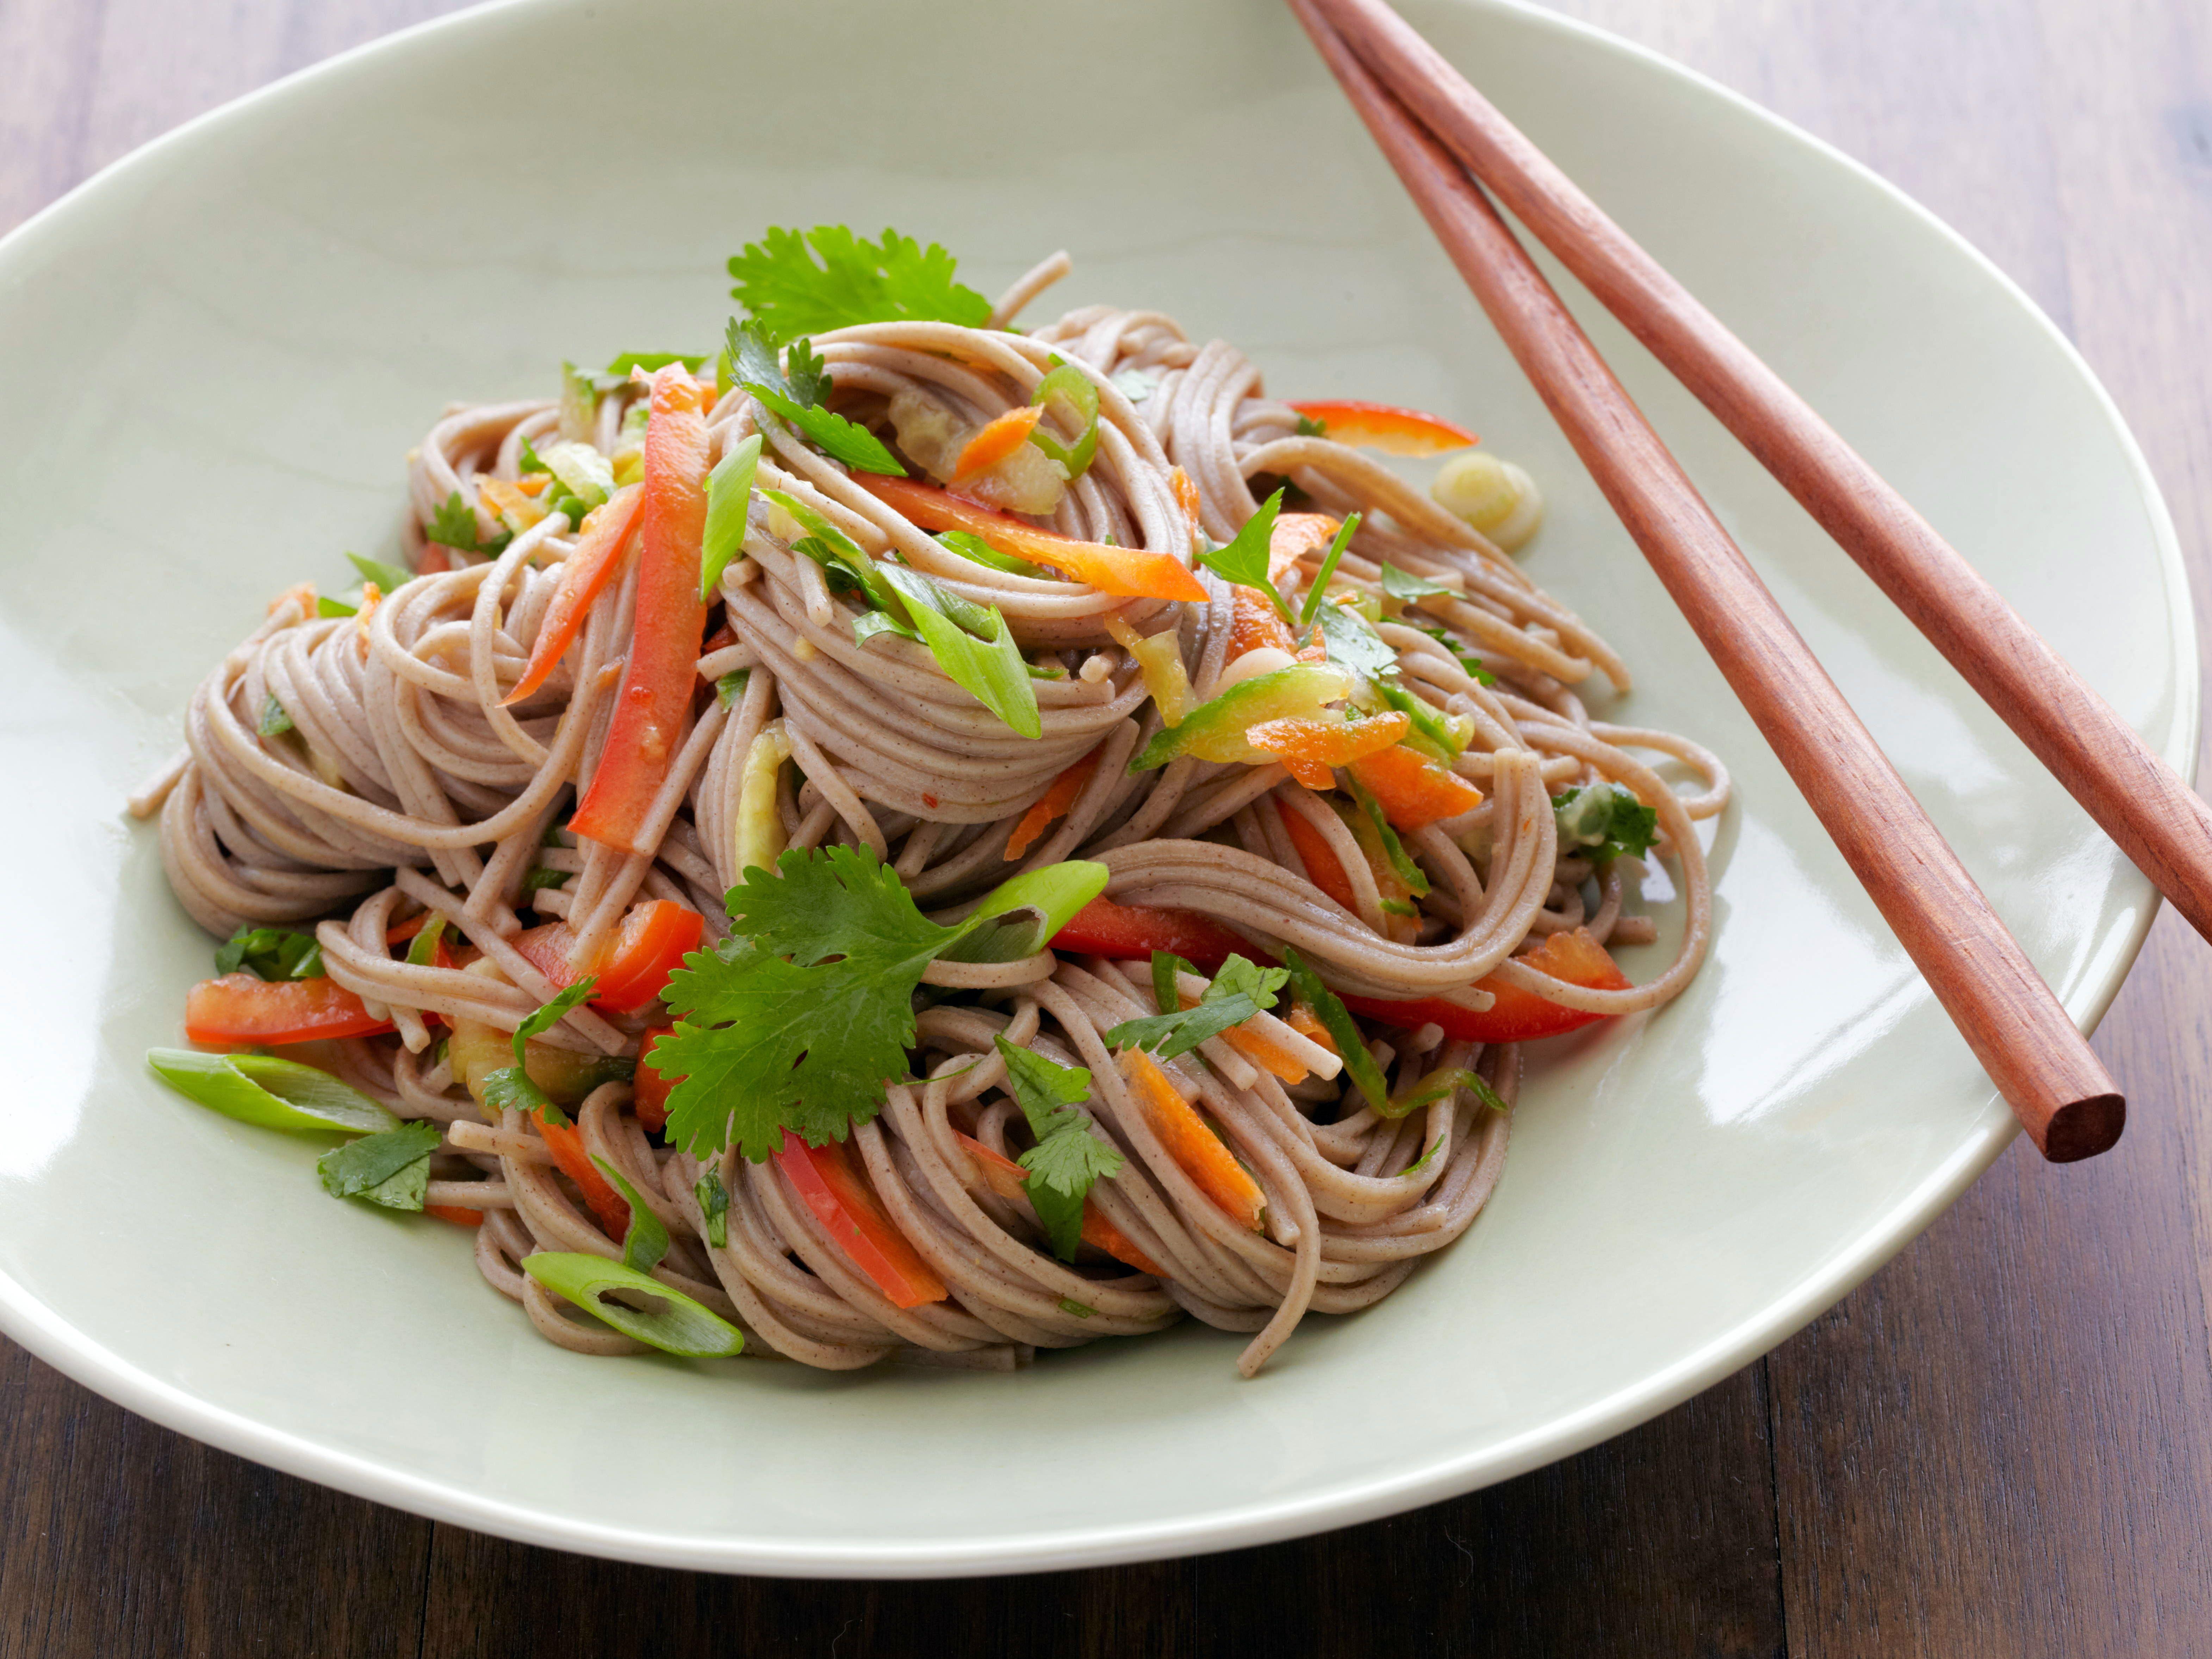 Buckwheat noodle salad recipe buckwheat noodles noodle salads buckwheat noodle salad forumfinder Choice Image